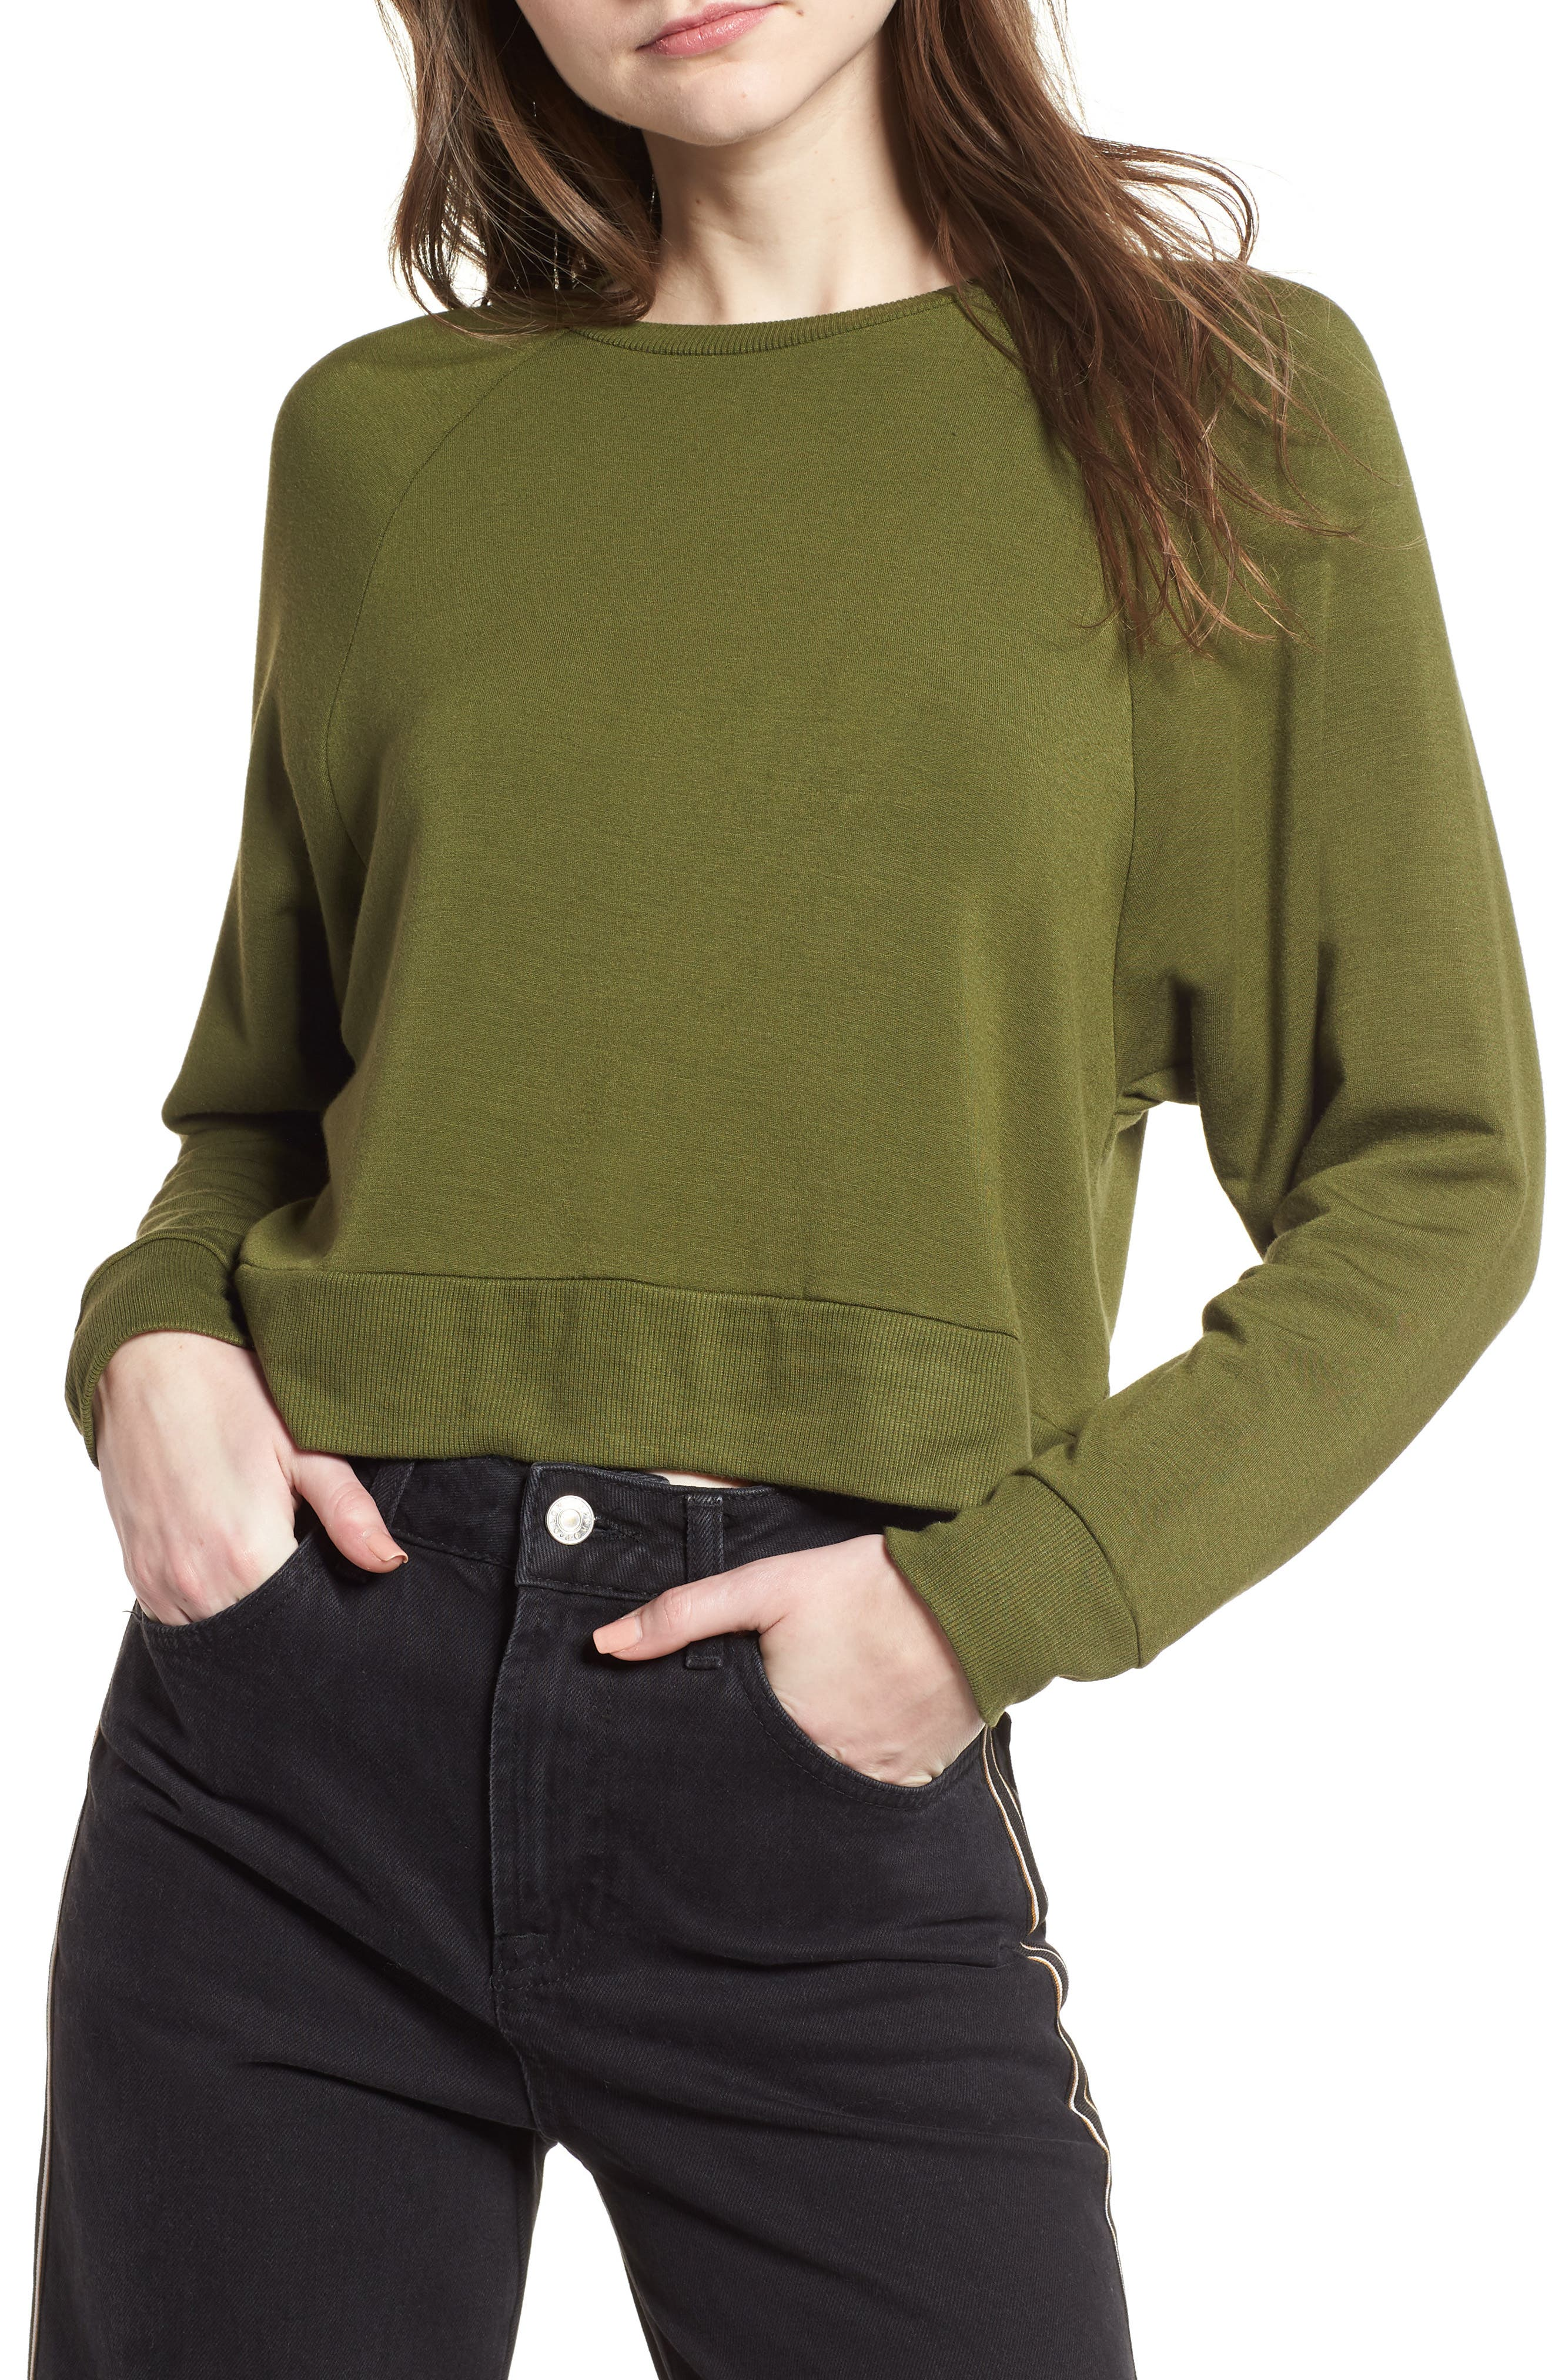 Topshop Raglan Sweatshirt